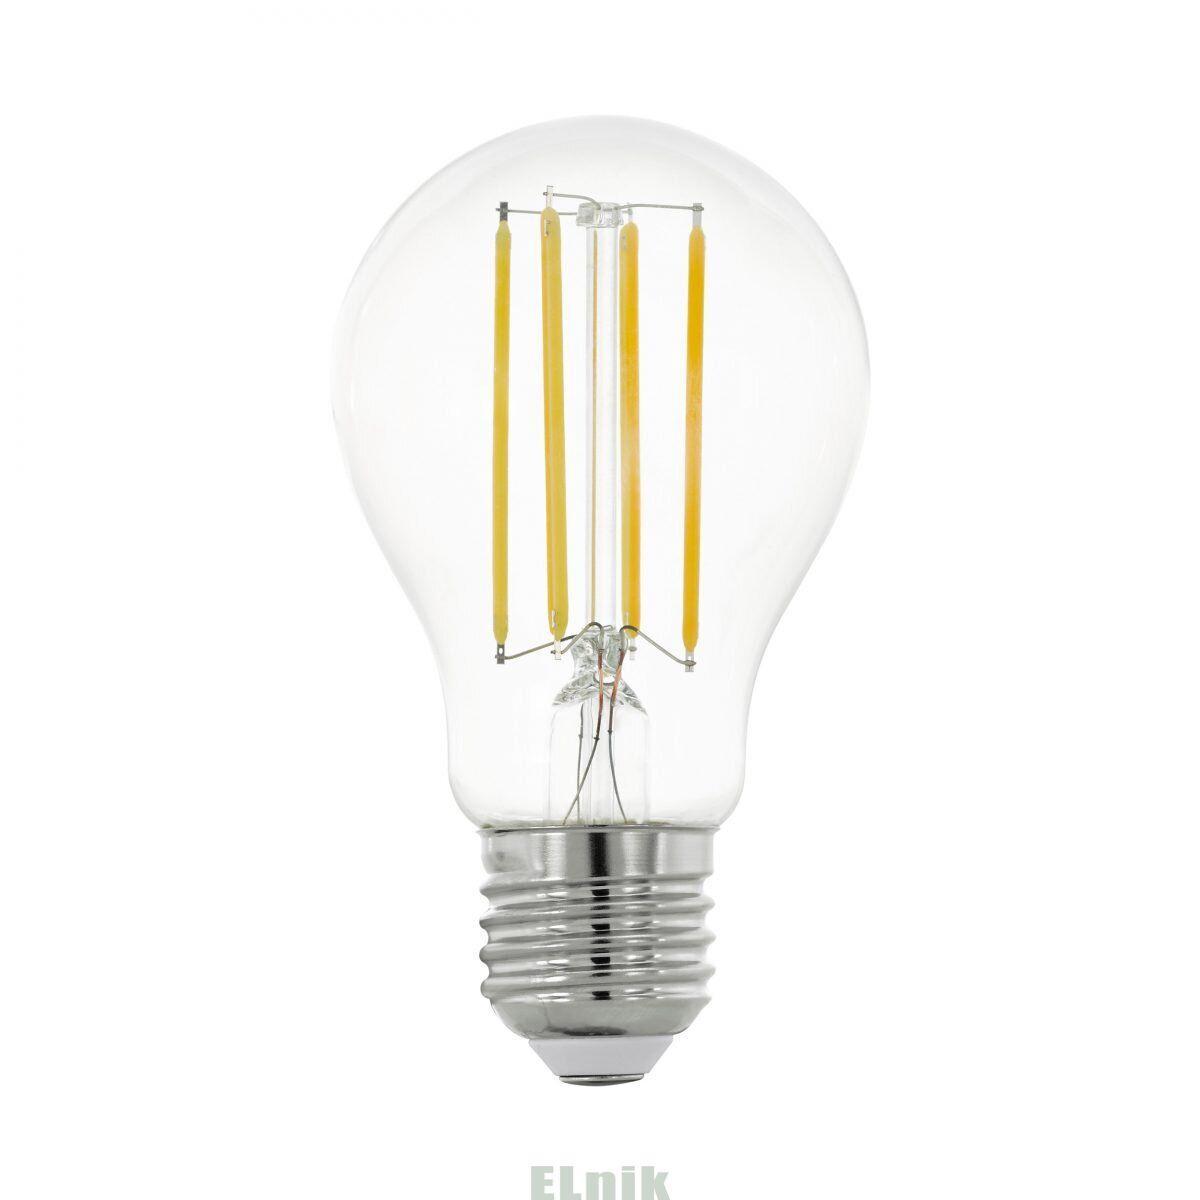 Лампа светодиодная филаментная LM LED E27 2700K, Eglo [11755]